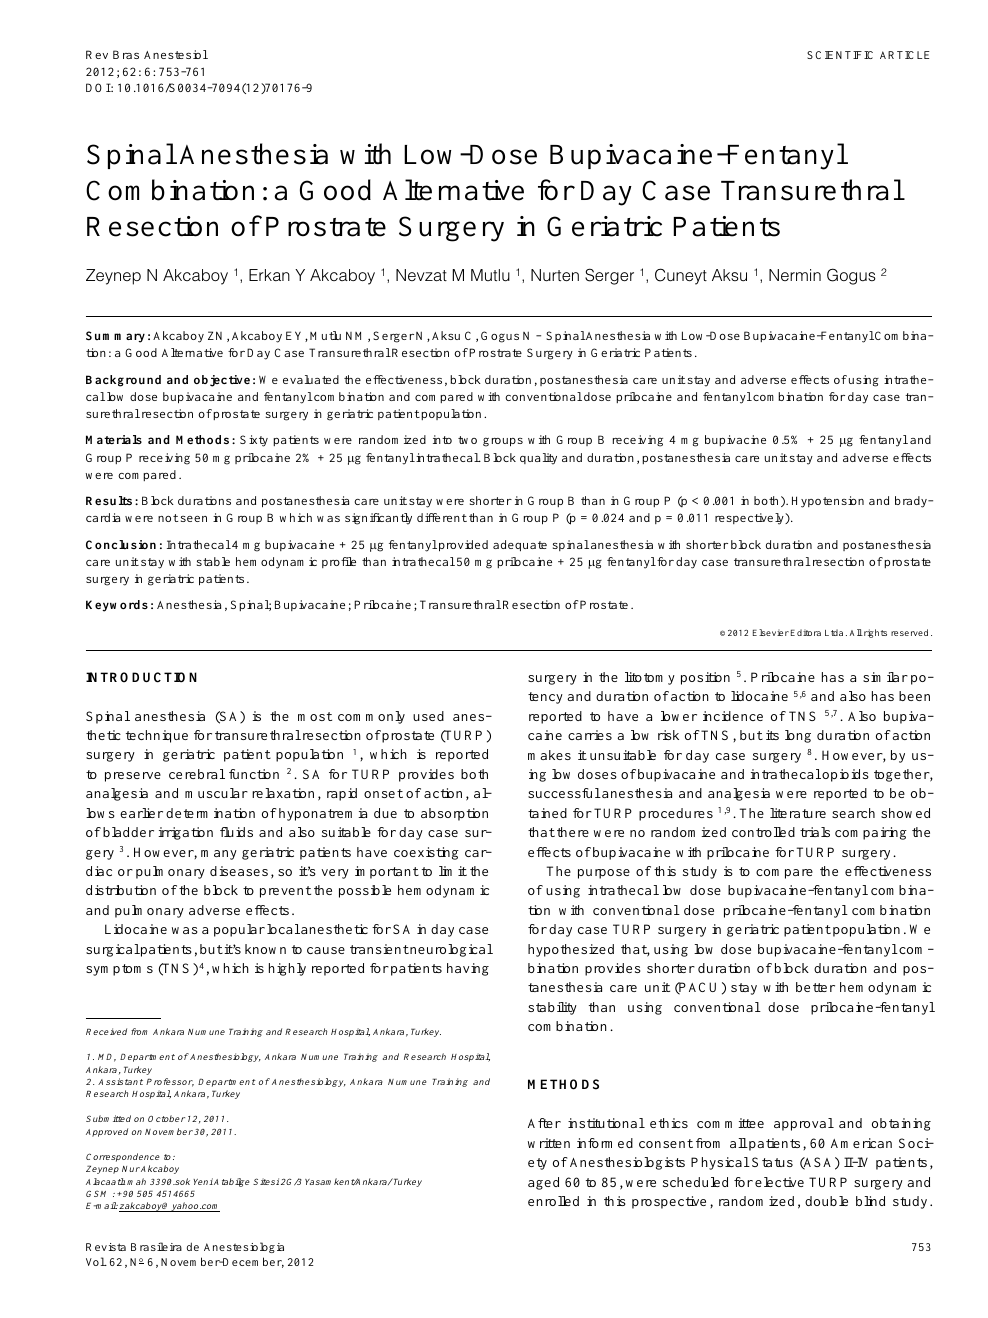 Operacion de prostata turp